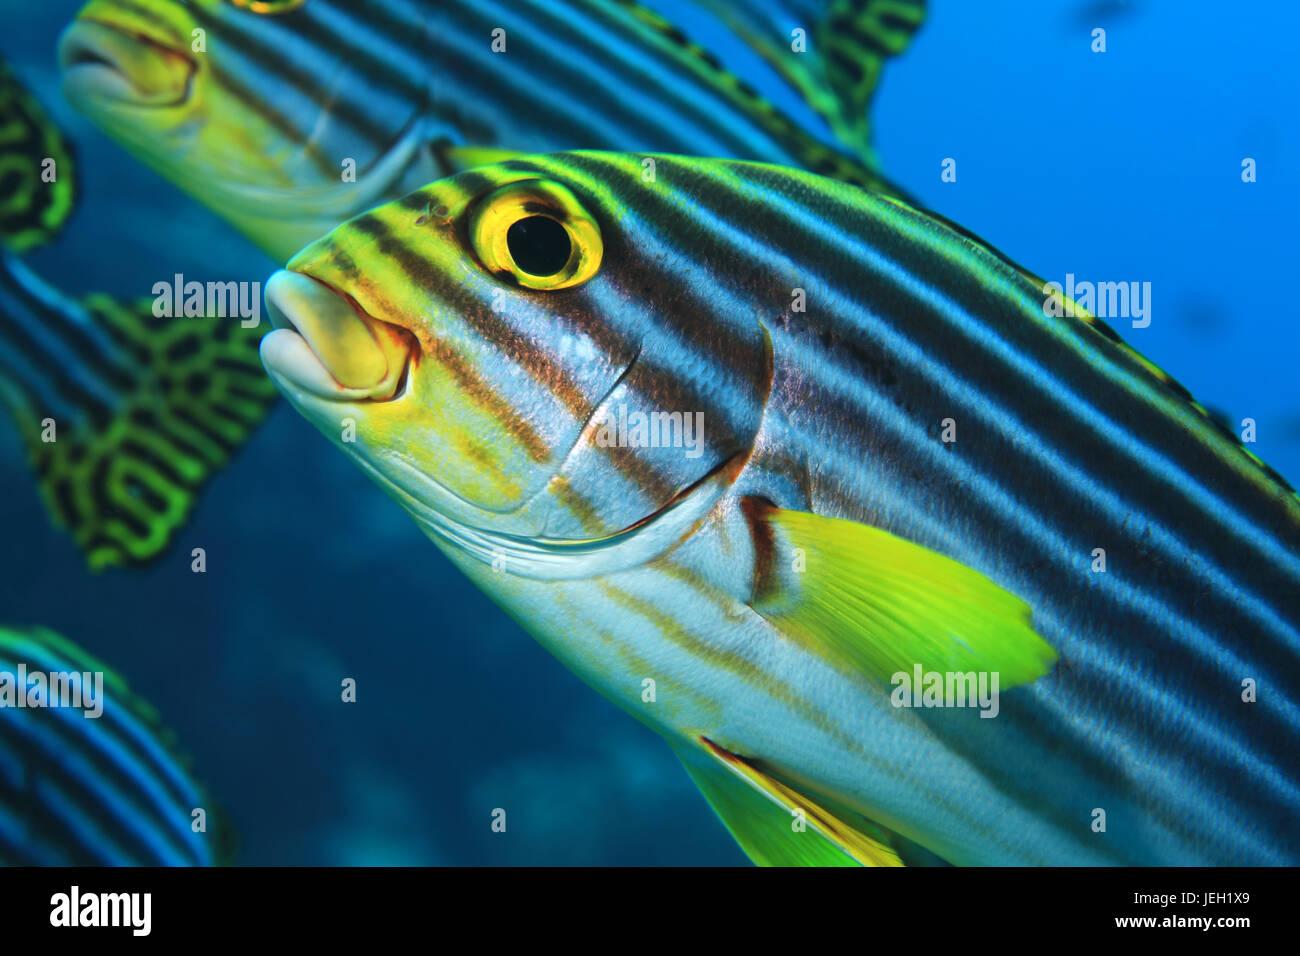 Oriental sweetlips pesce (Plectorhinchus orientalis) sott'acqua nel tropicale oceano indiano Immagini Stock